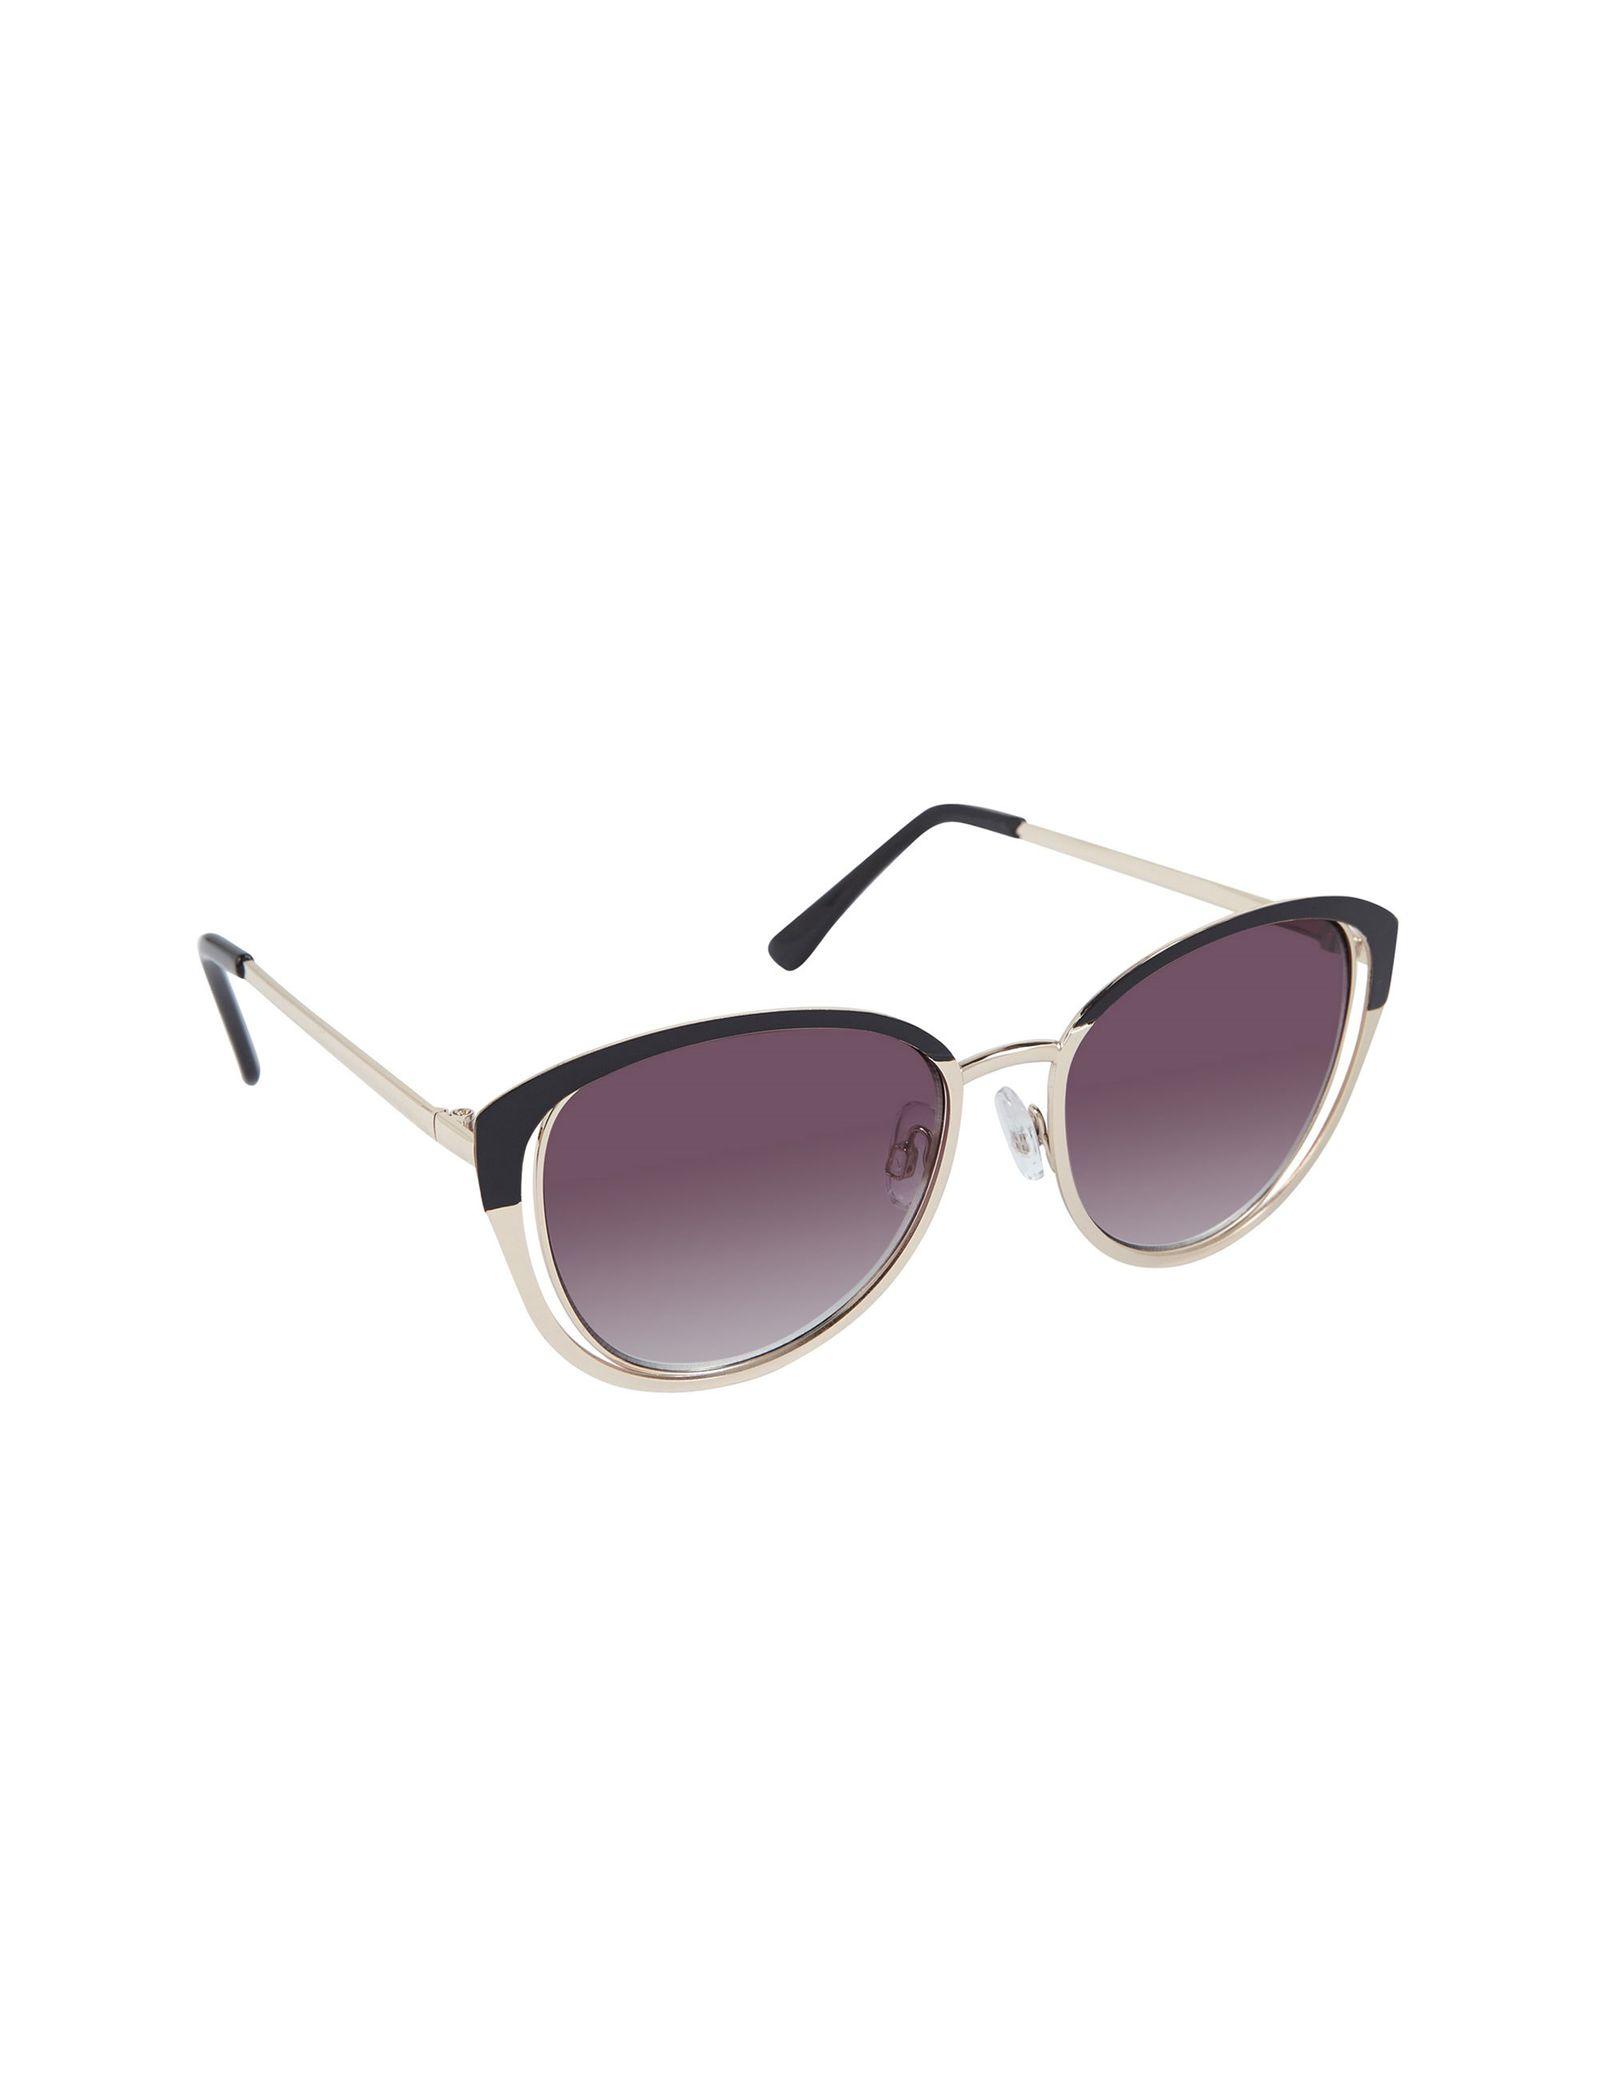 عینک آفتابی پروانه ای زنانه - کال ایت اسپرینگ - مشکي و طلايي - 1